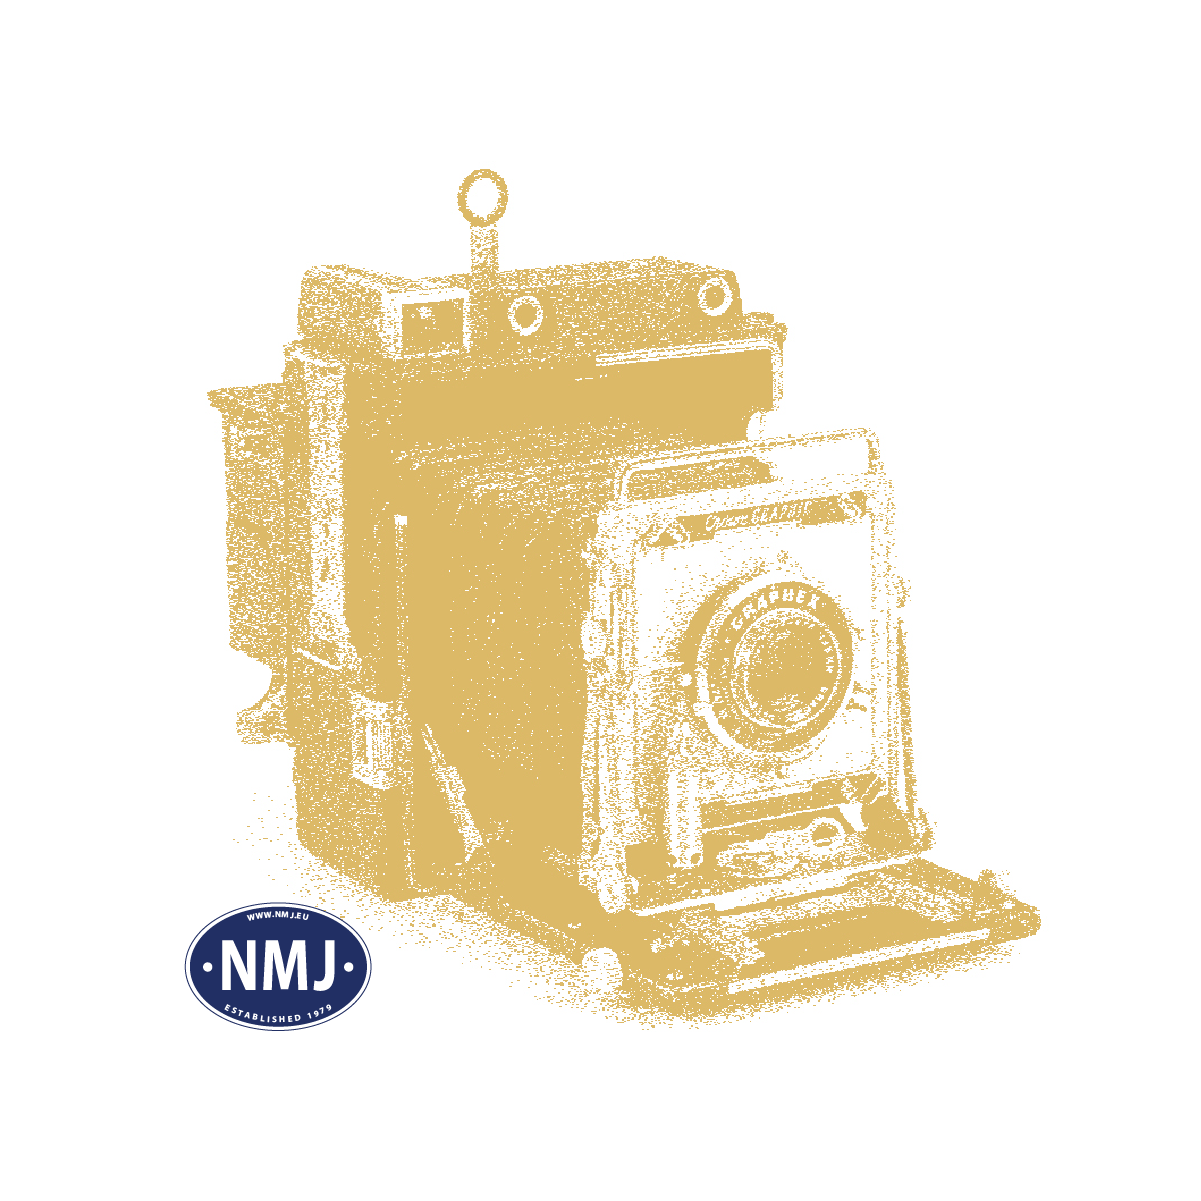 NOC15038 - Lagermedarbeidere